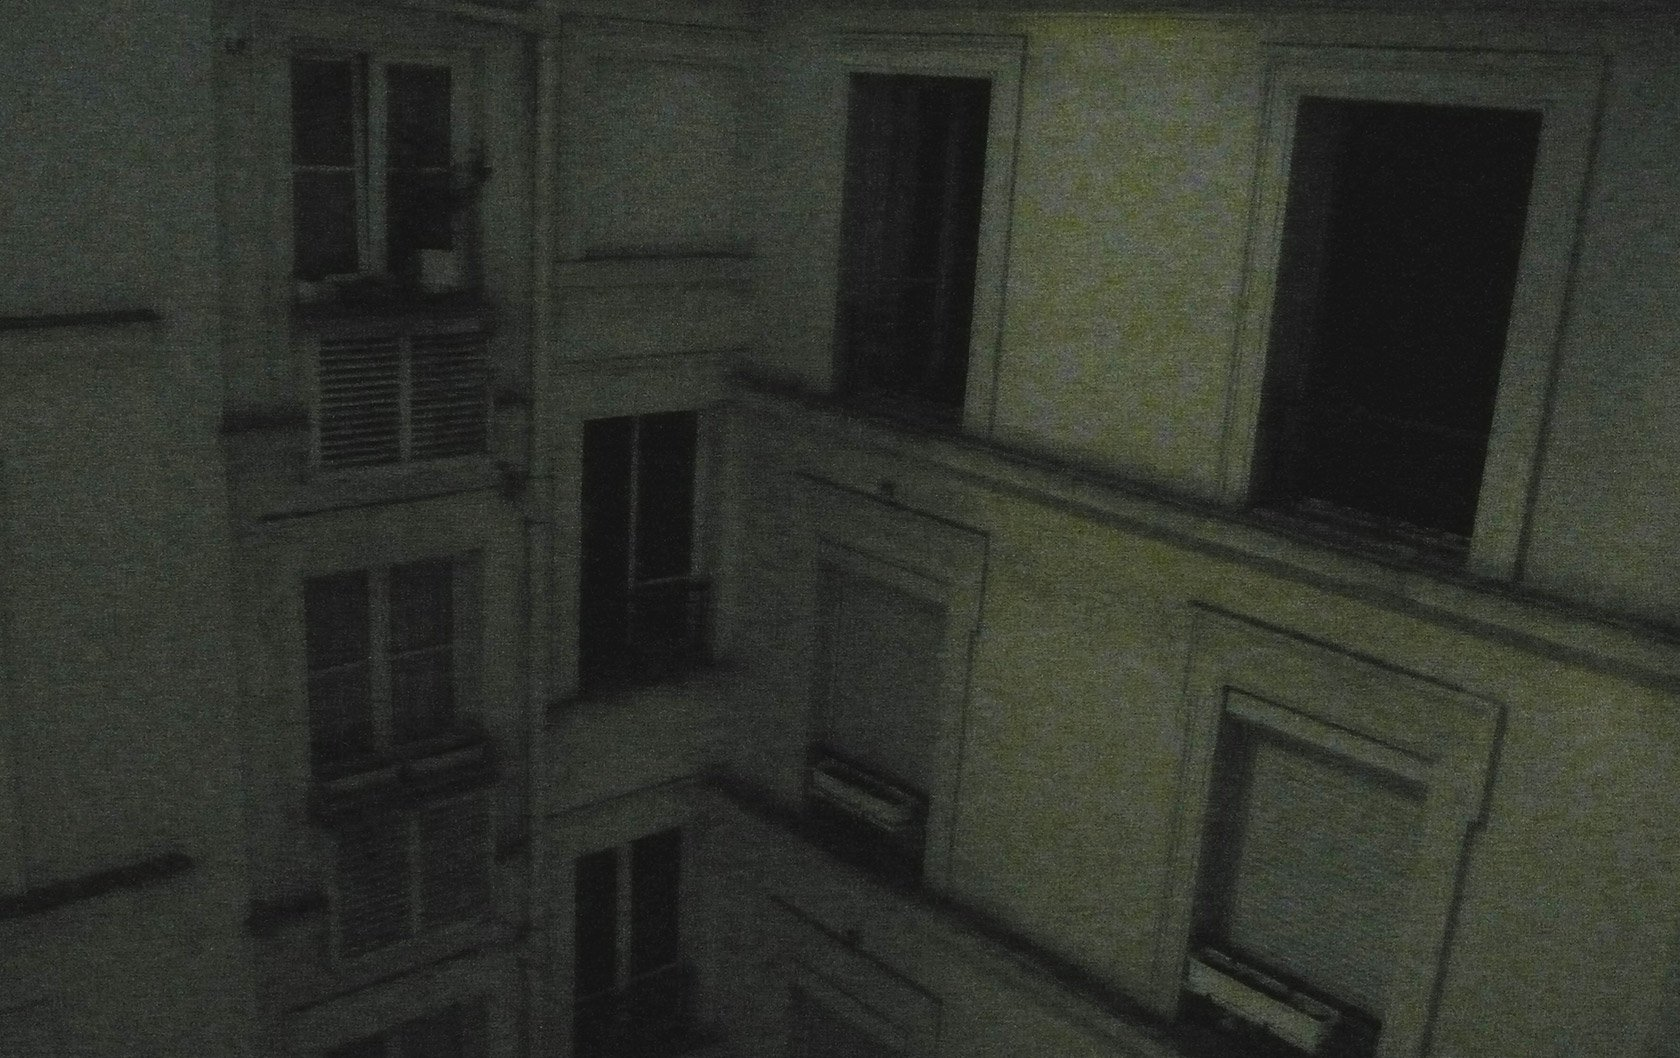 merlot-courtyard-views